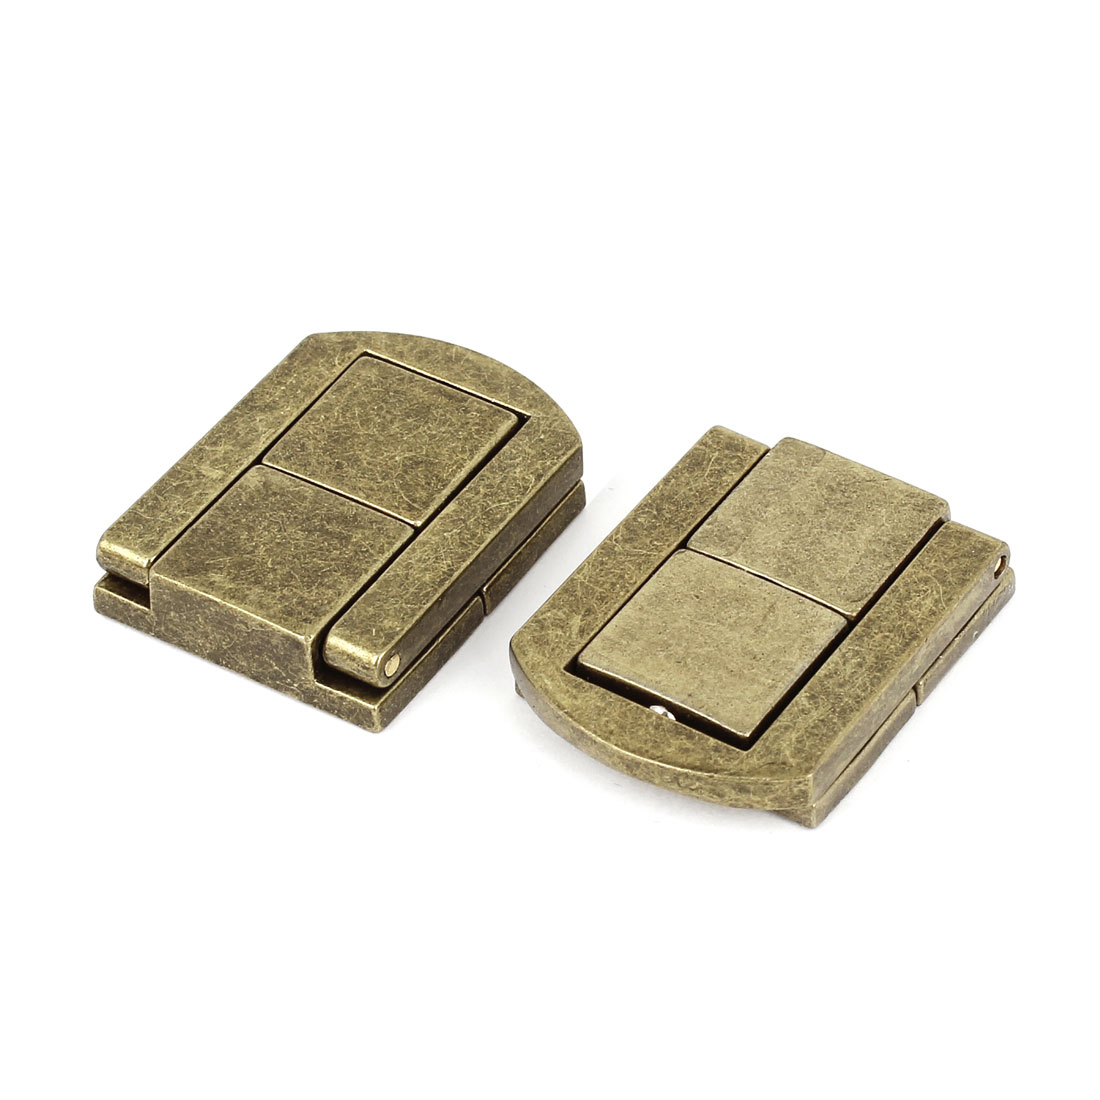 Unique Bargains Jewelry Box Chest Case Draw Spring Latch Bronze Tone 31mm x 24mm 2Pcs